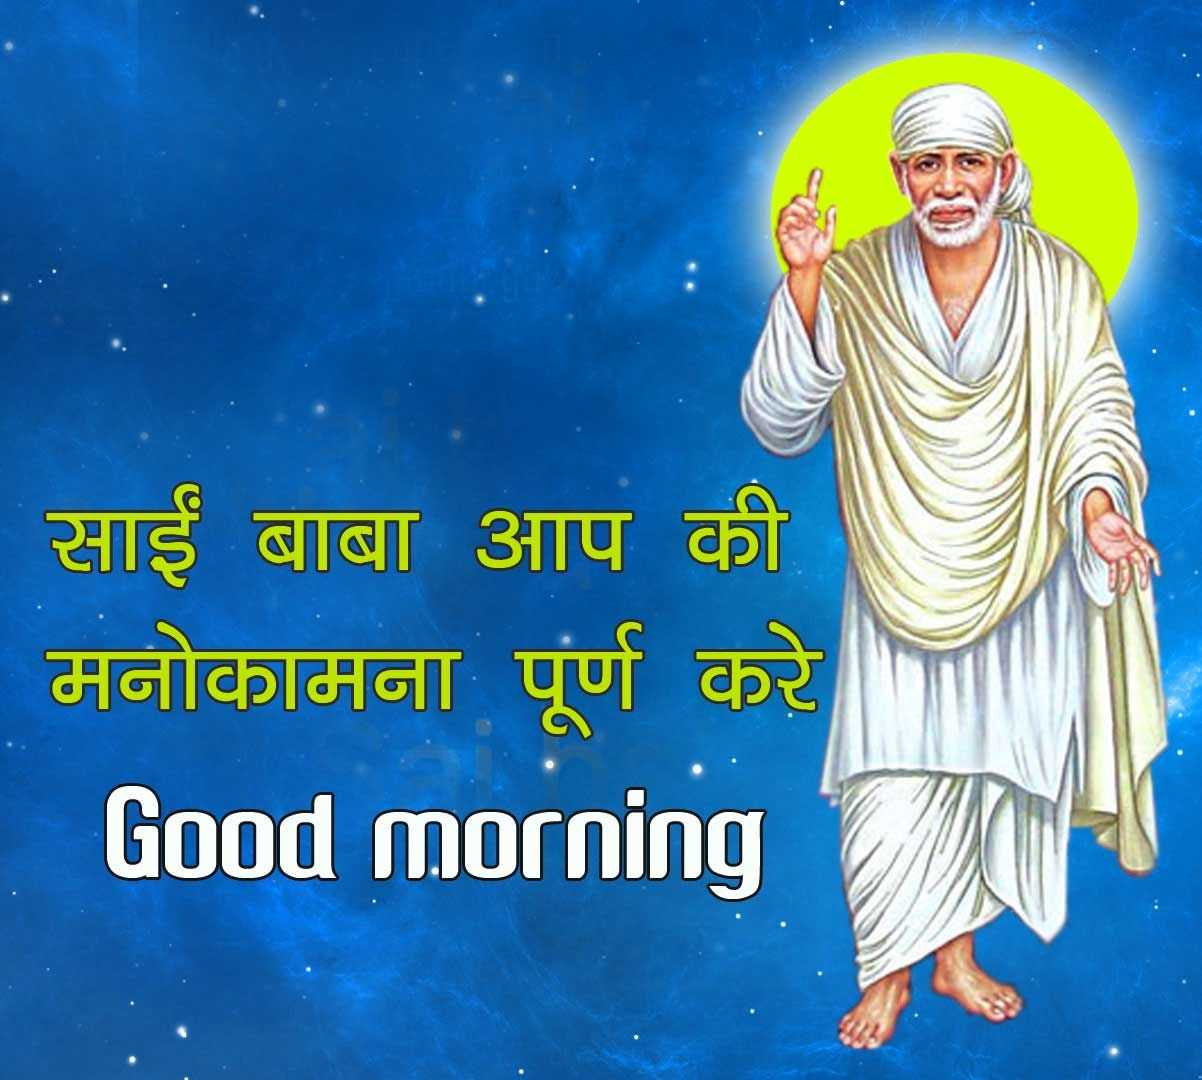 Om Sai Ram Good Morning Hd Wallpaper - Om Sai Ram Good Morning Hd Wallpaper